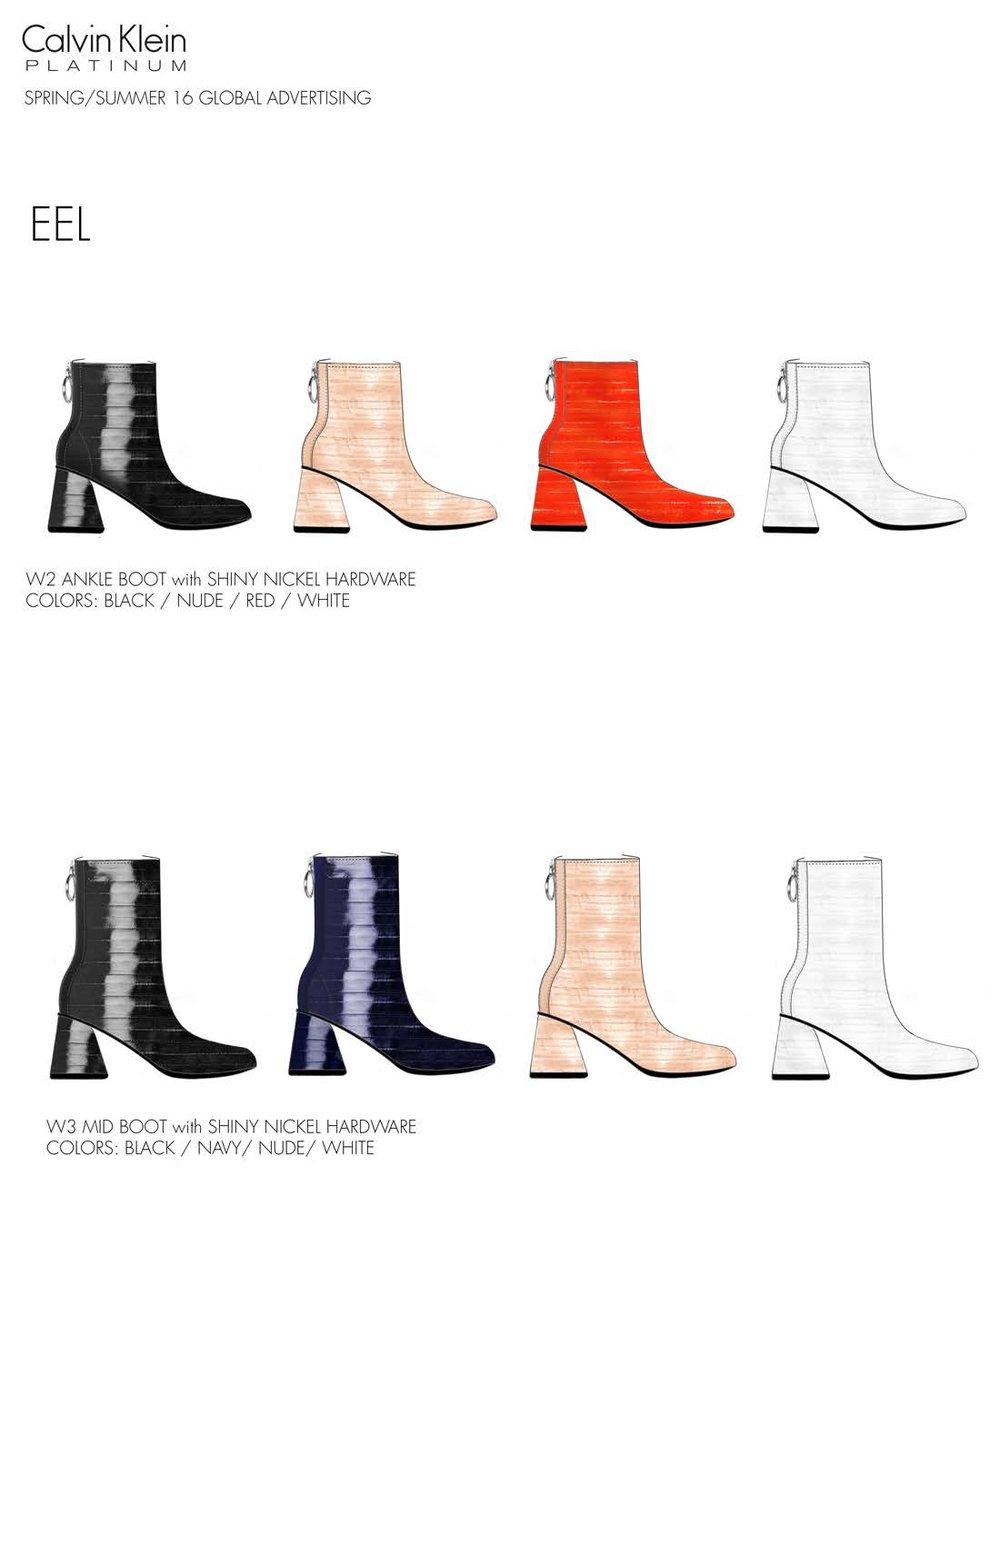 7.KGRESS Portfolio-SS16 CKP AD Footwear_Page_14.jpg